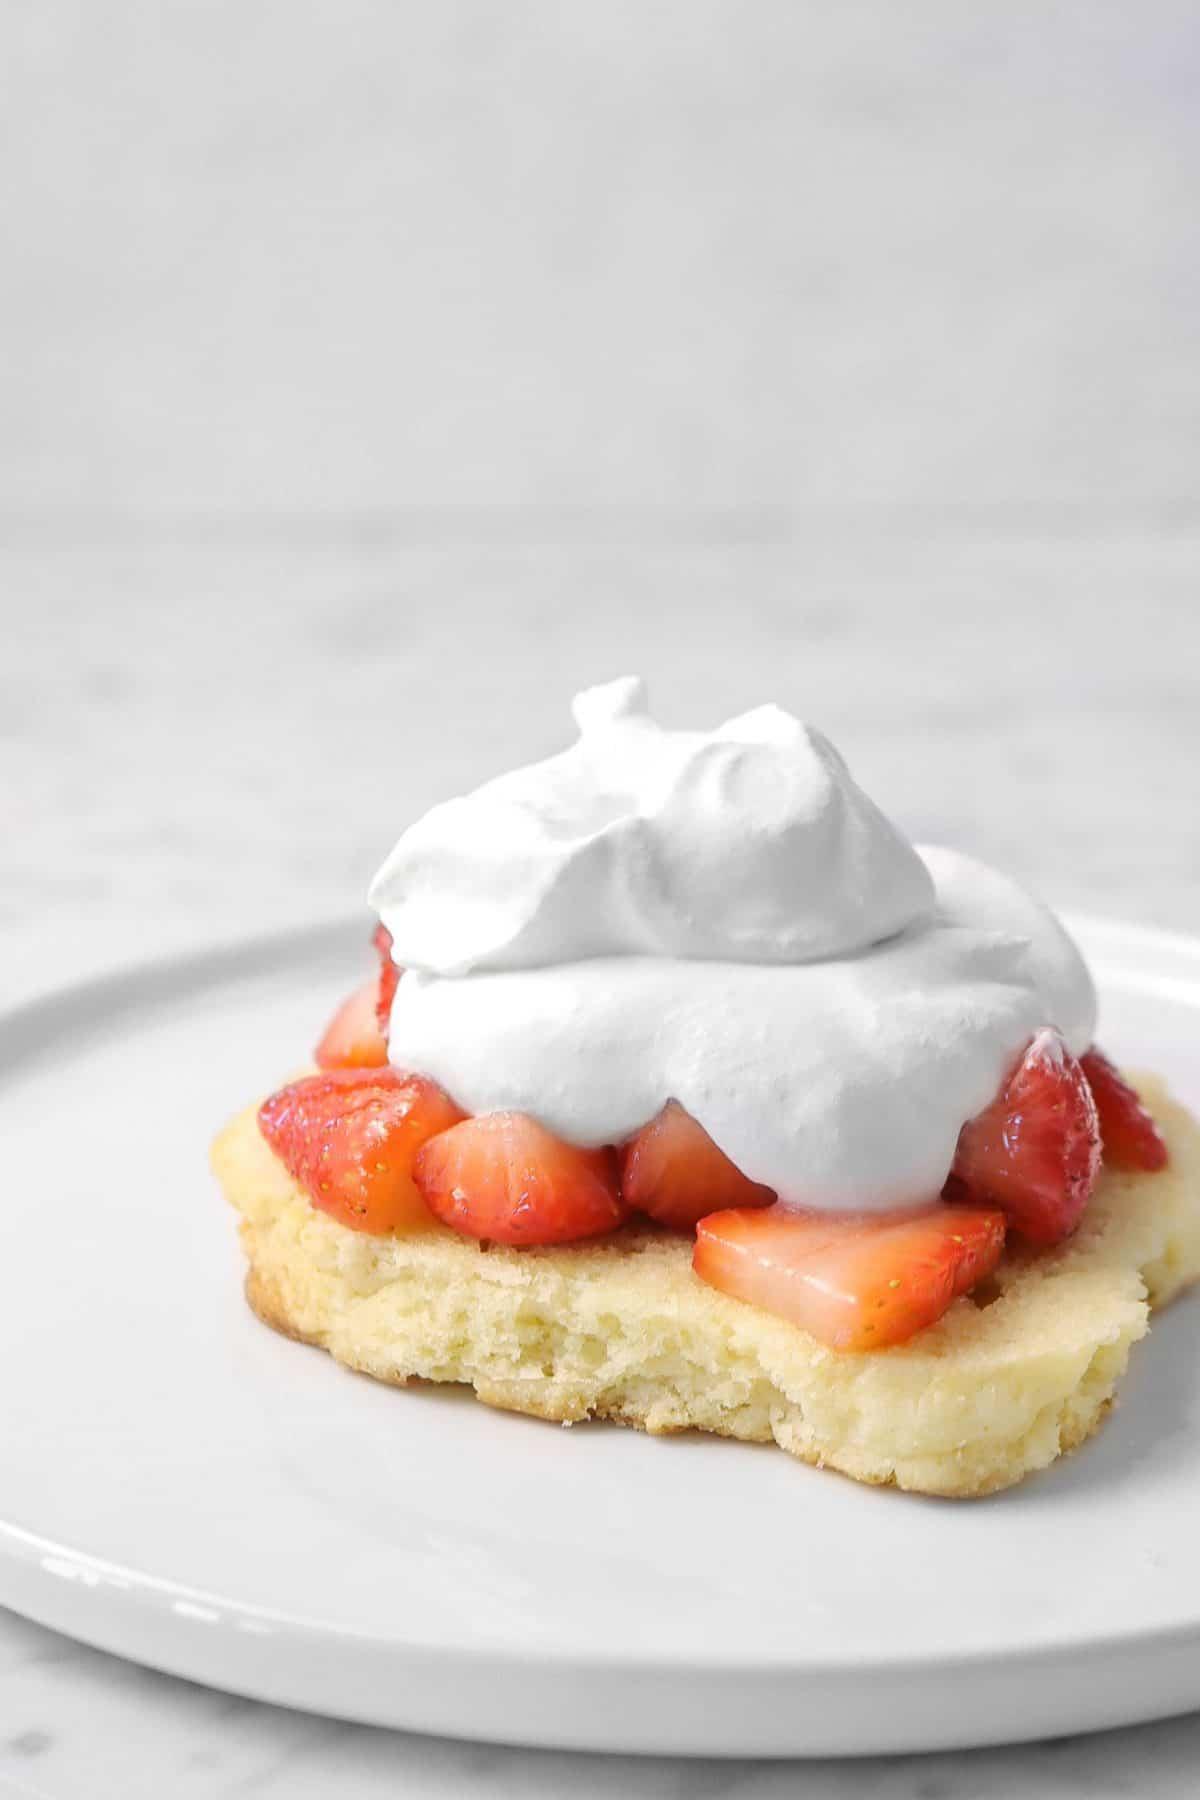 whip cream added to shortcake